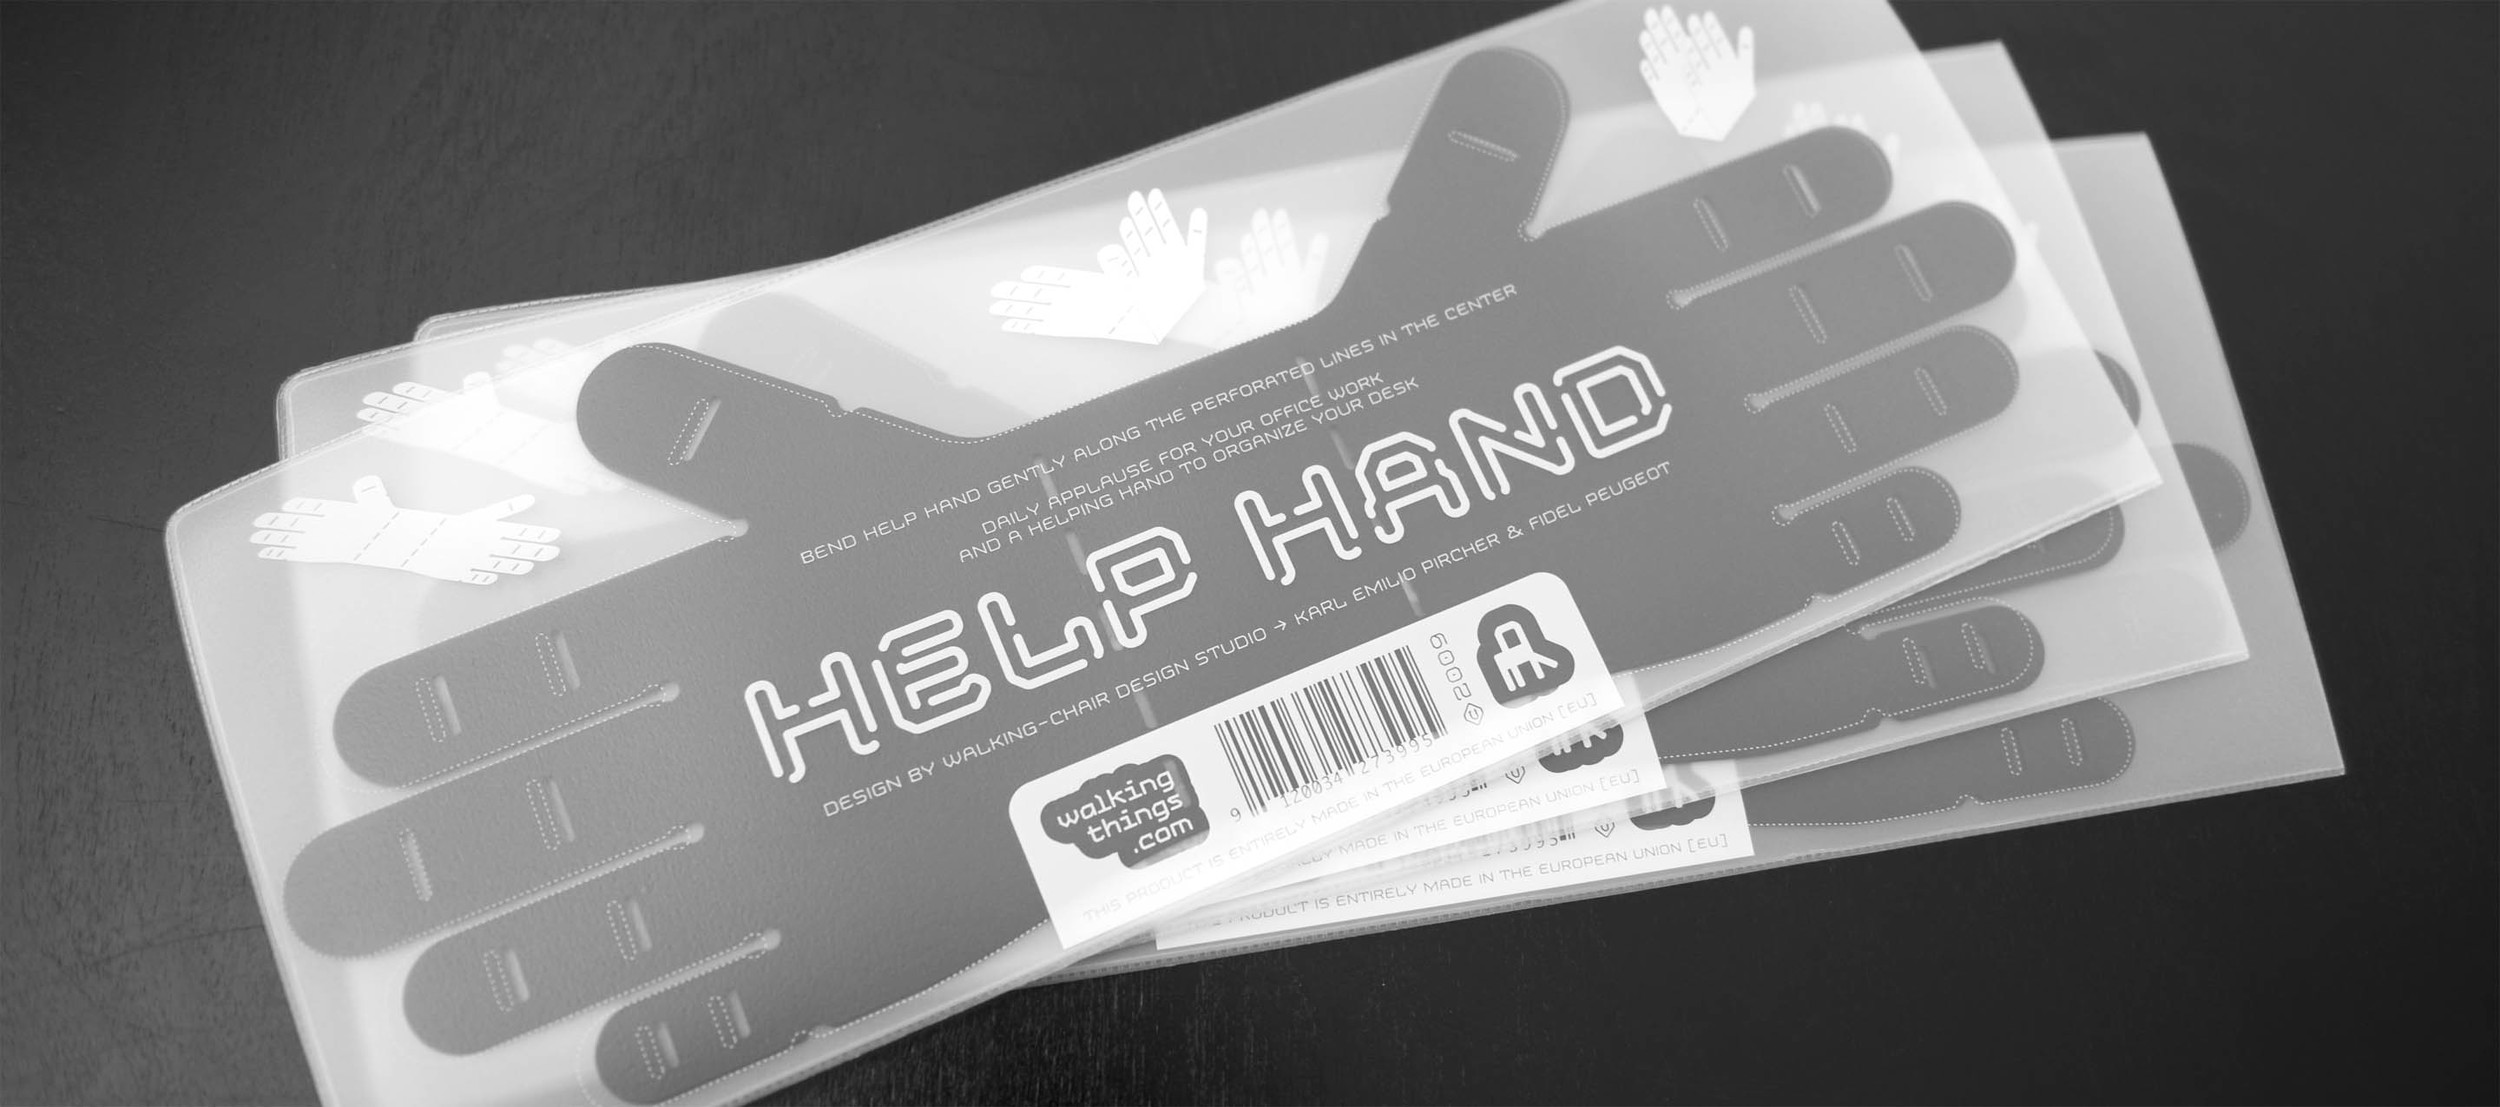 helphand_2526P.jpg